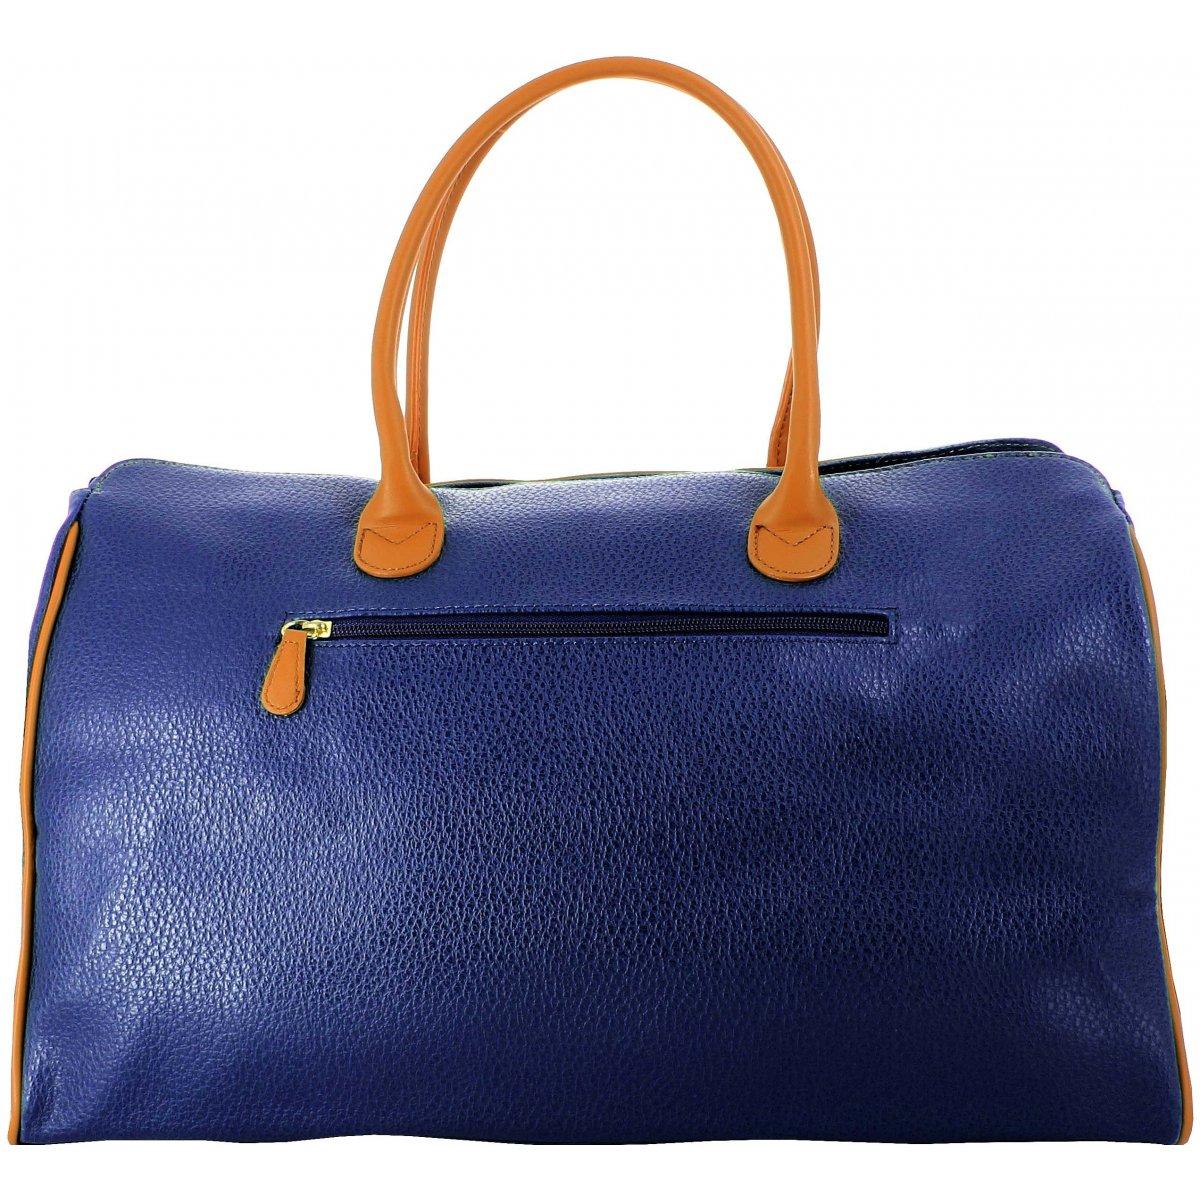 sac de voyage 48h david jones 77775c couleur bleu. Black Bedroom Furniture Sets. Home Design Ideas